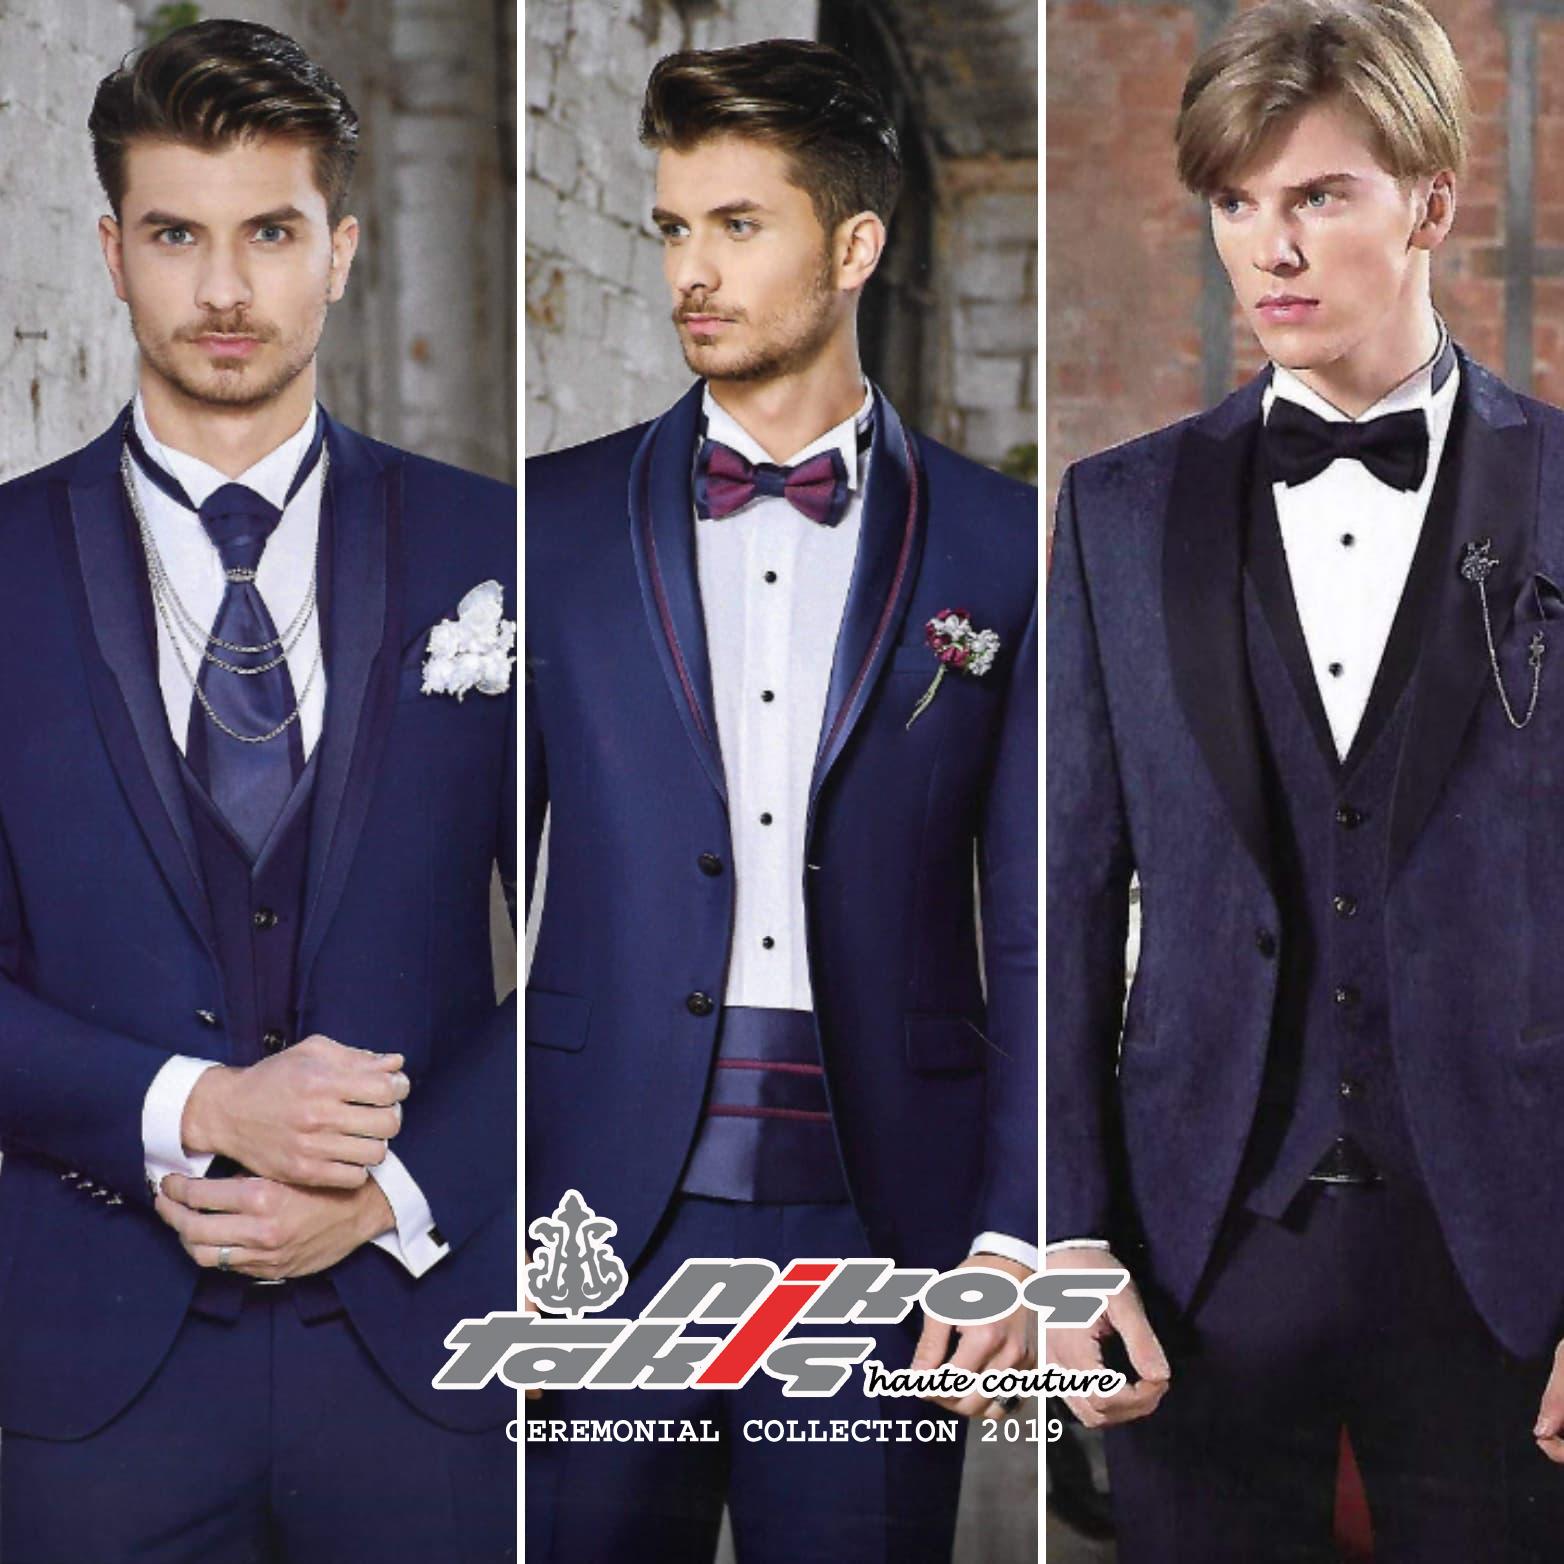 triplet suits 2019 in blue LOGO